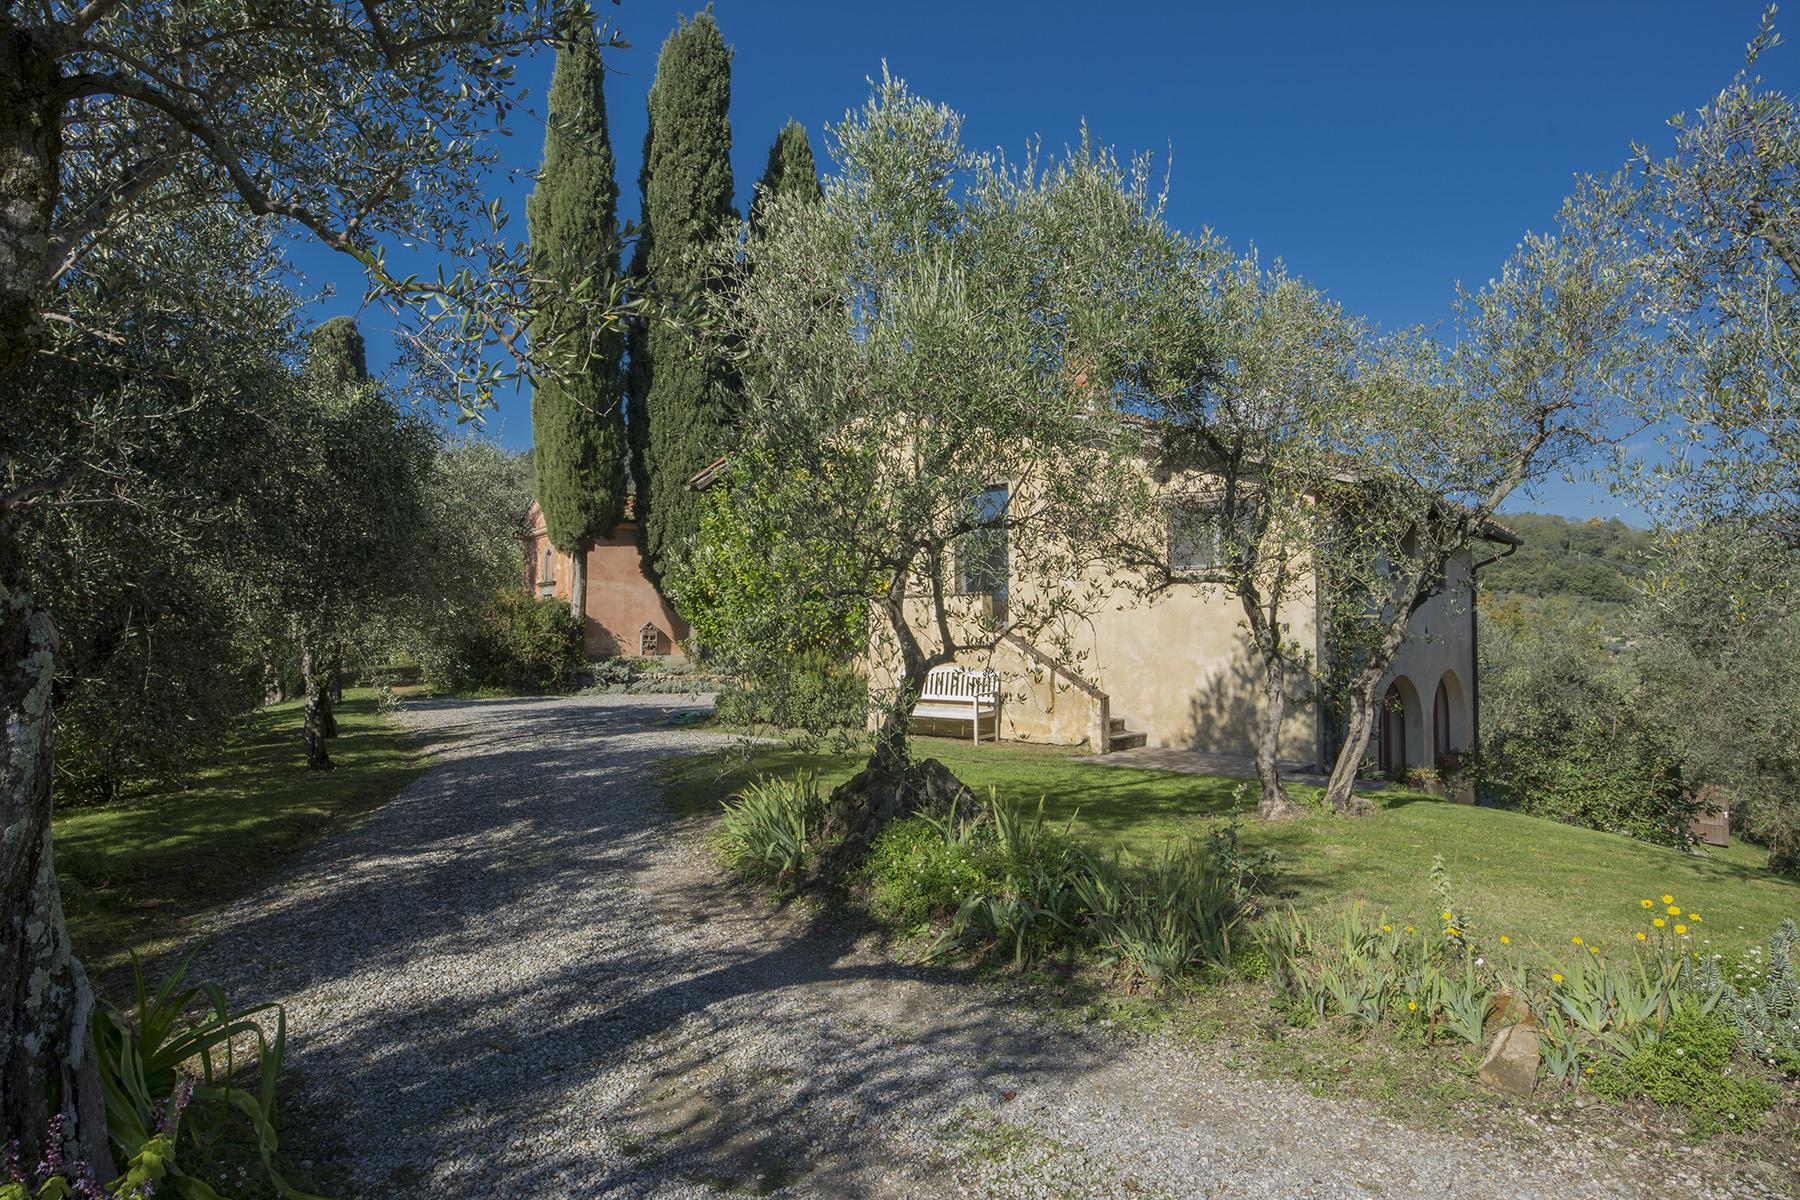 Rustico in Vendita a Lucca: 5 locali, 540 mq - Foto 19